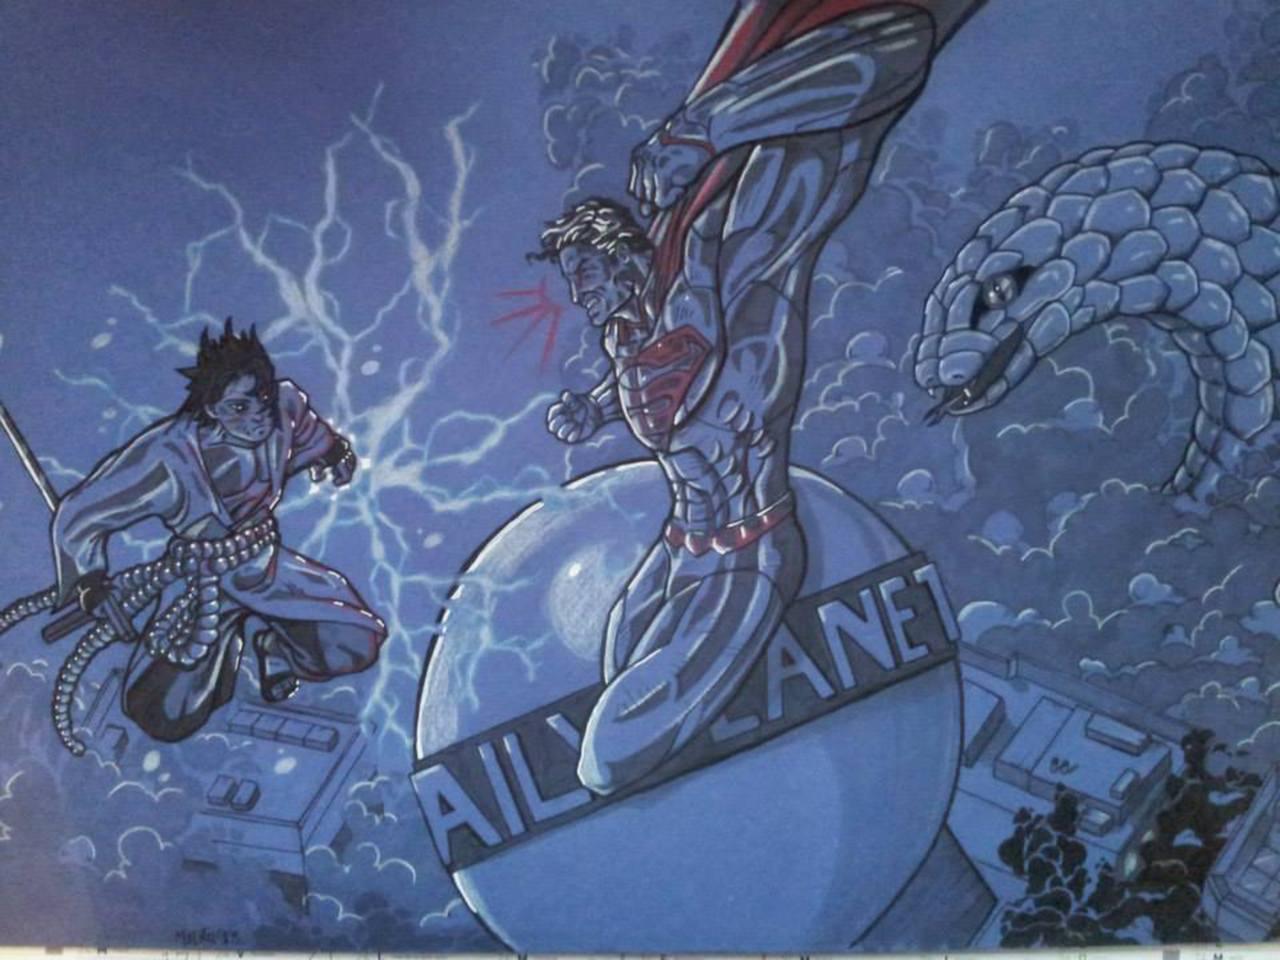 Sasuke versus Superman